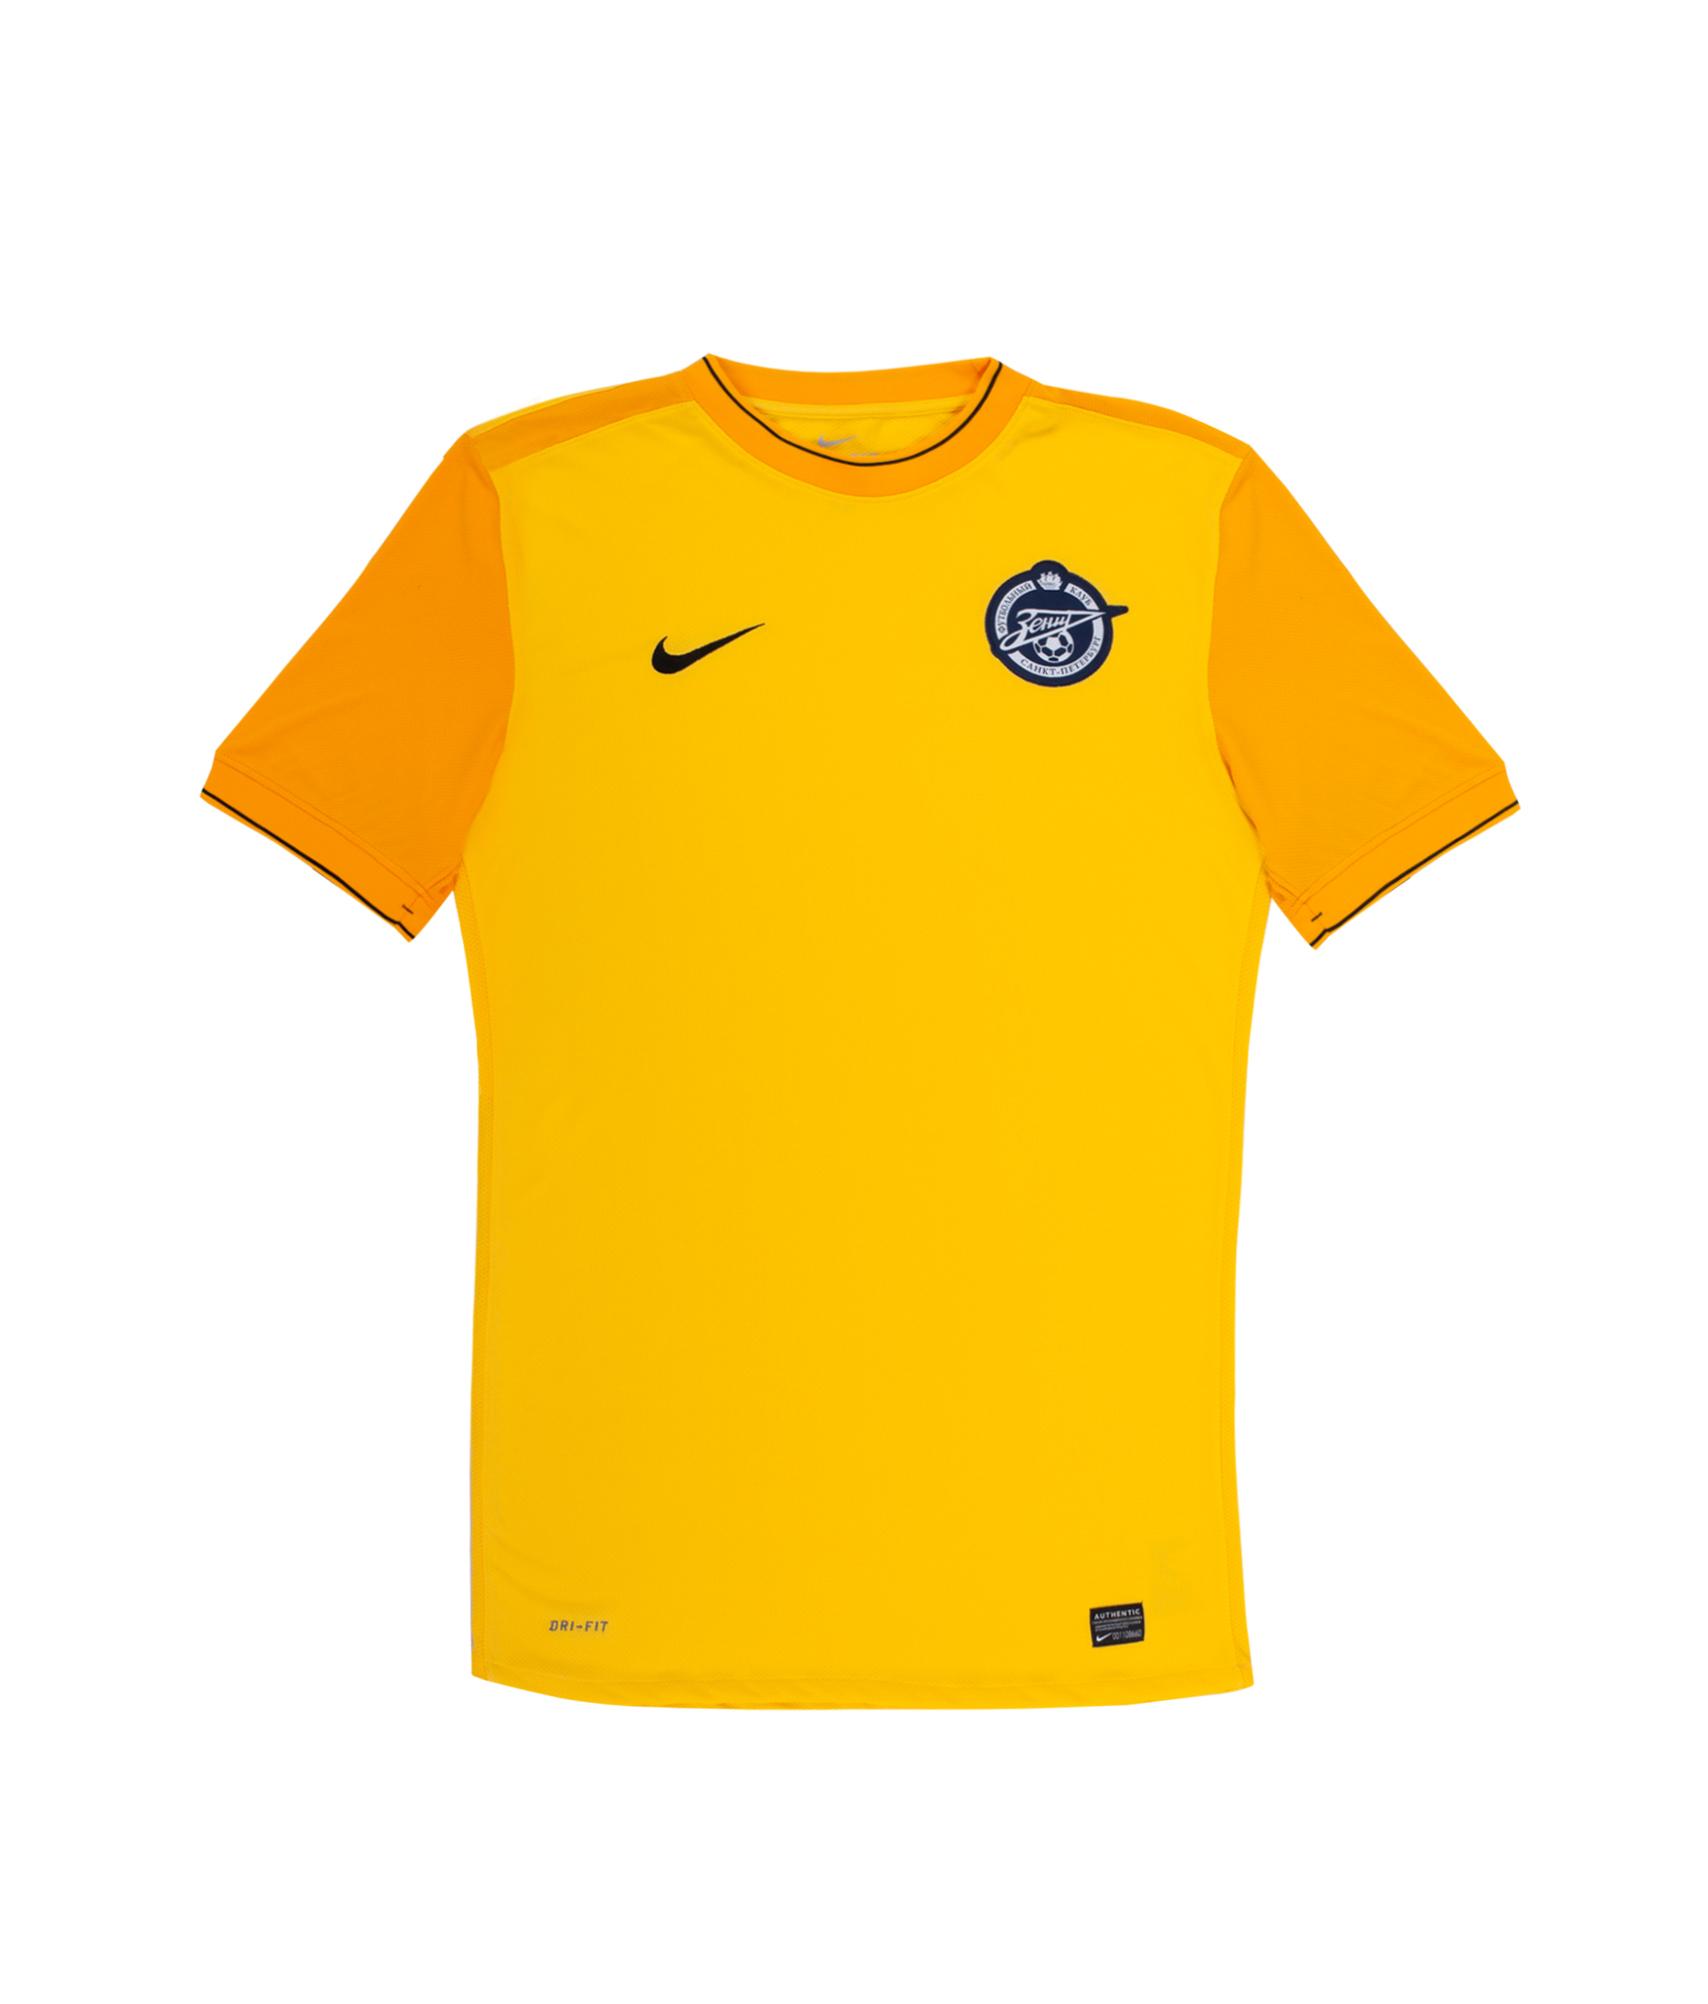 Футболка вратарская, Цвет-Желтый, Размер-XL